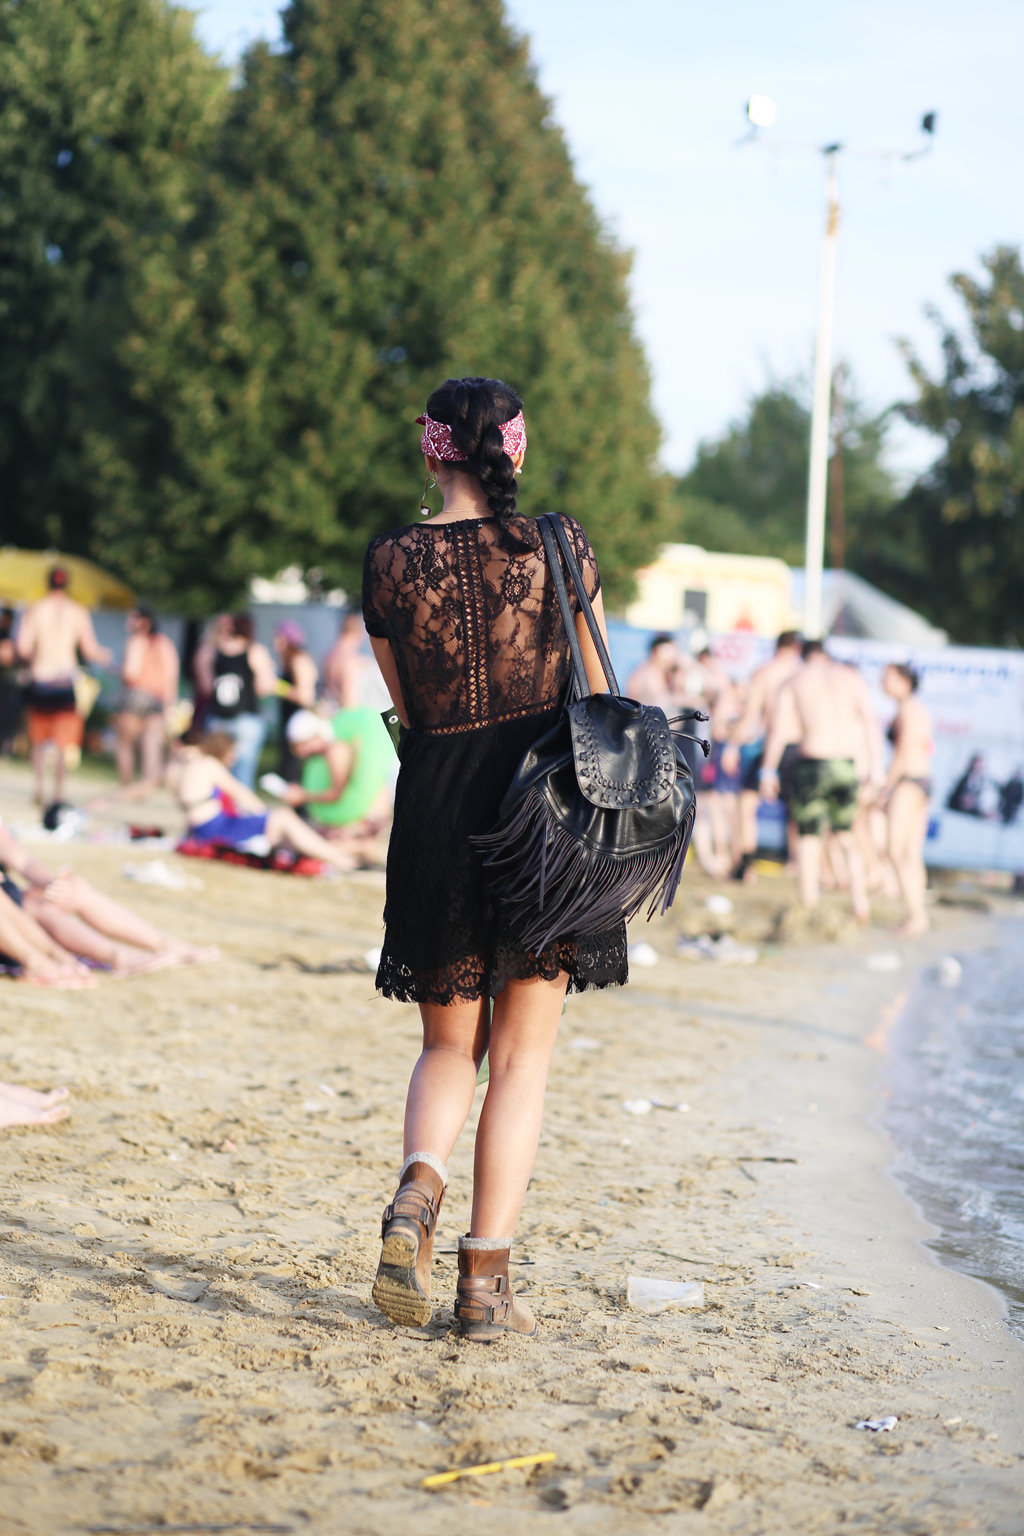 thefashionanarchy_utopia_island_festival_summer_sommer_outfit_look_style_lacedress_spitzenkleid_sorel_boots_munich_muenchen_fashionblog_modeblog-styleblog_lifestyleblog_1